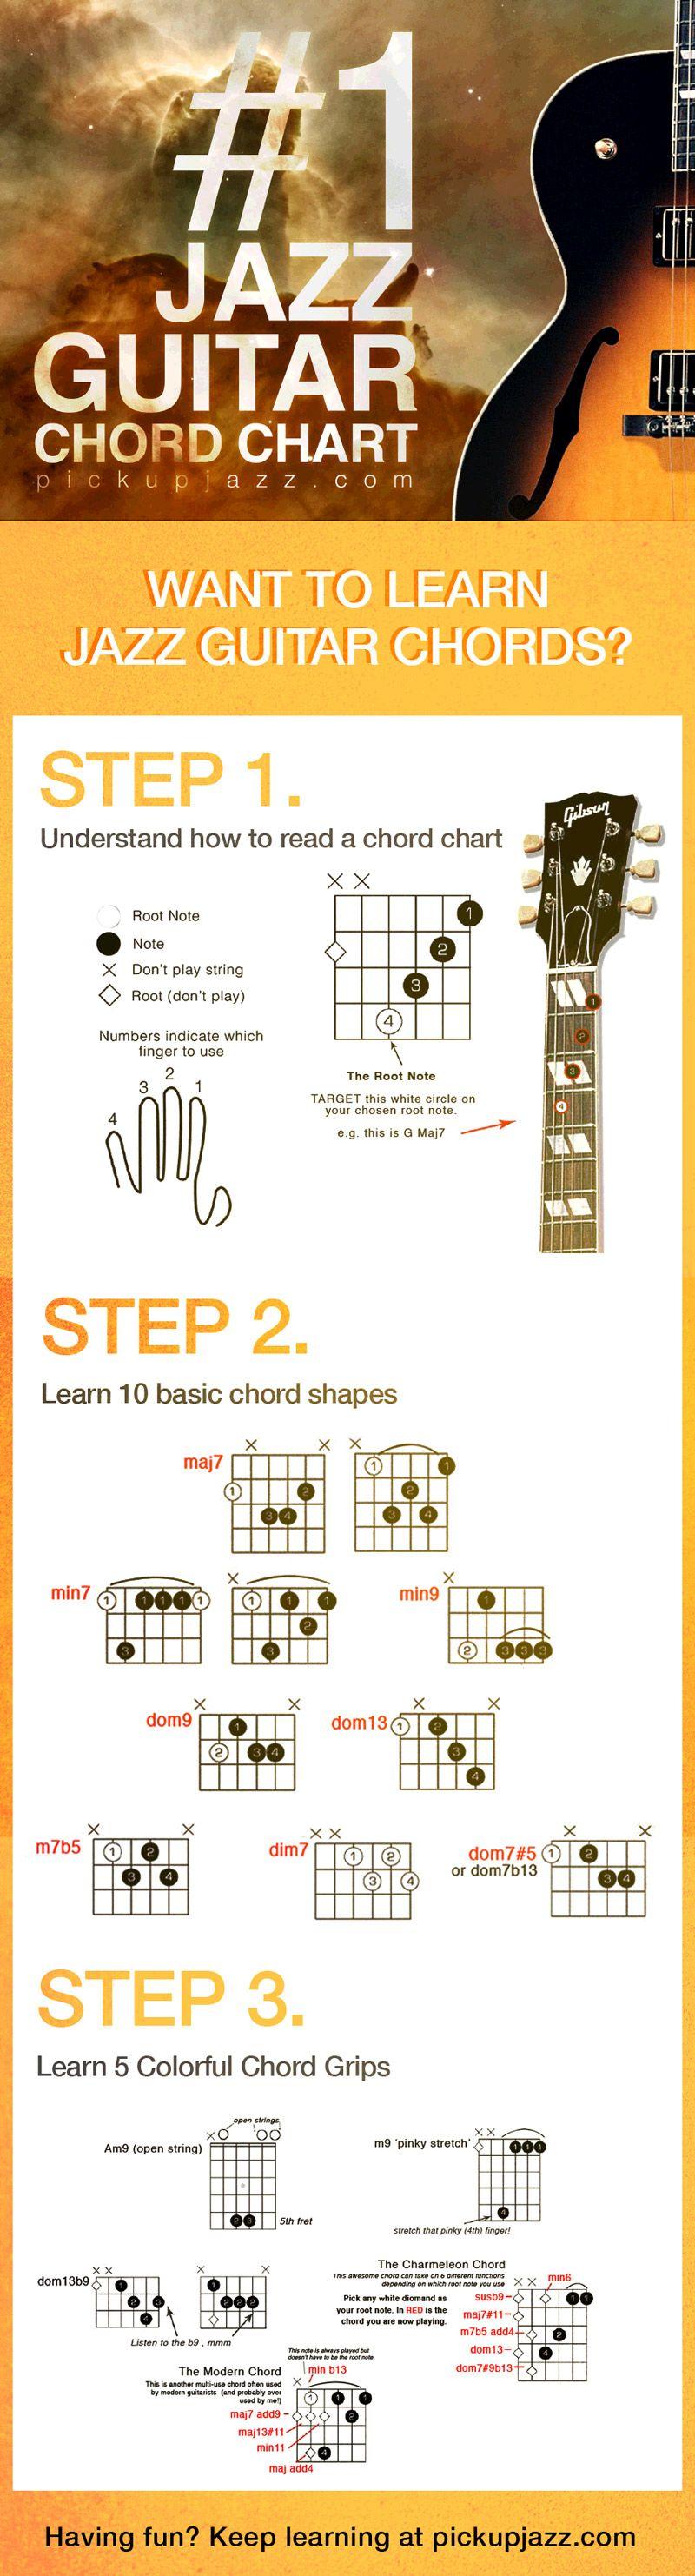 Jazz Guitar Chord Chart From Pickupjazz Jazzguitar D B